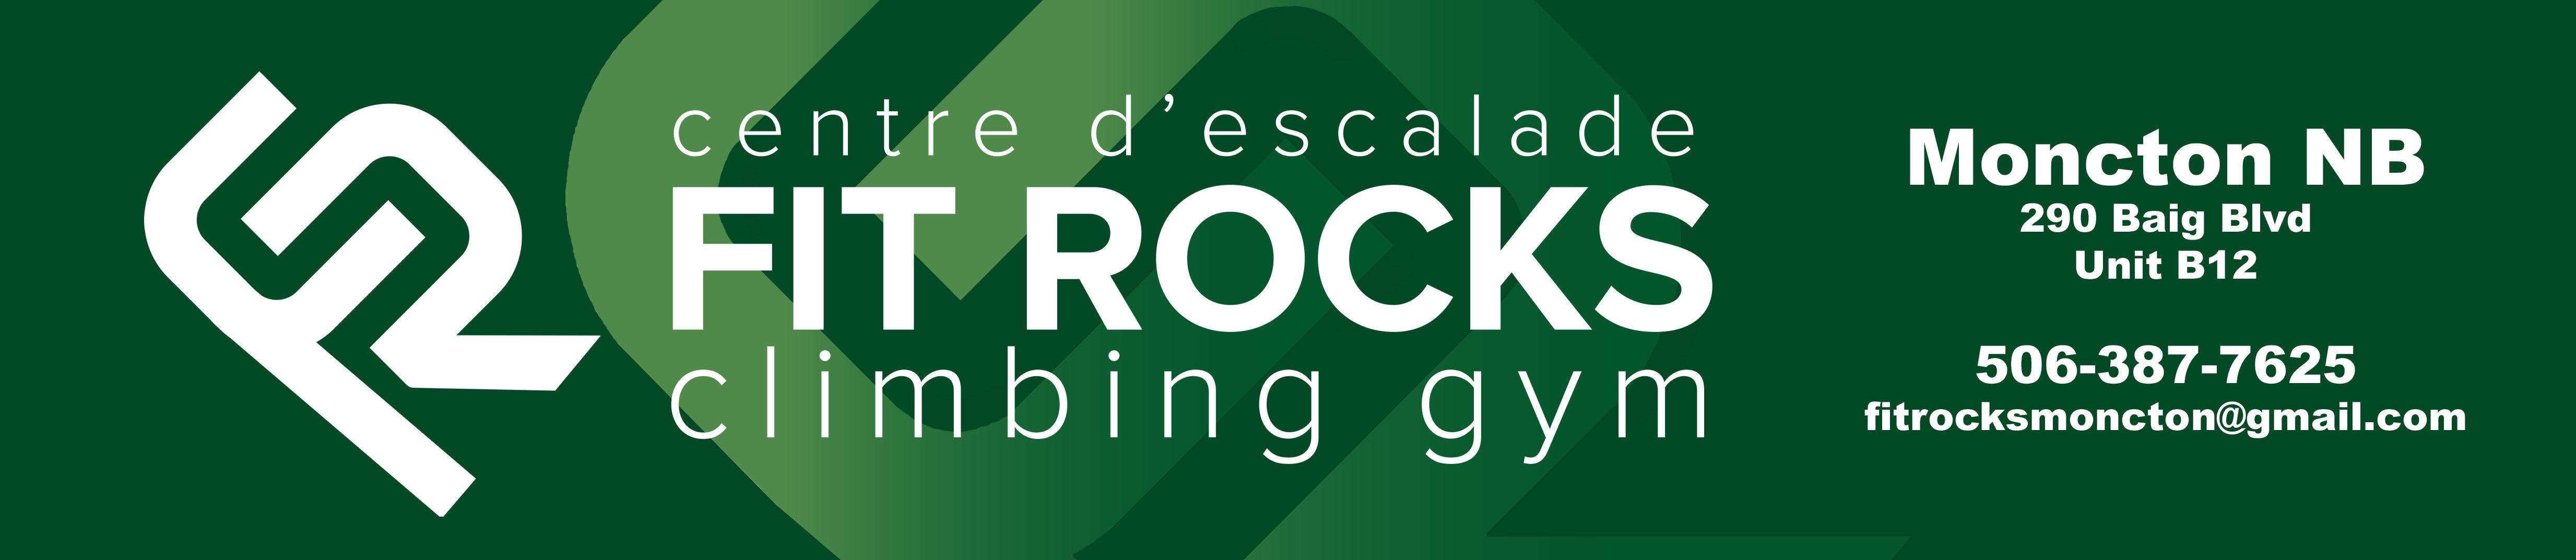 FitRocks Climbing Gyms – Moncton NB